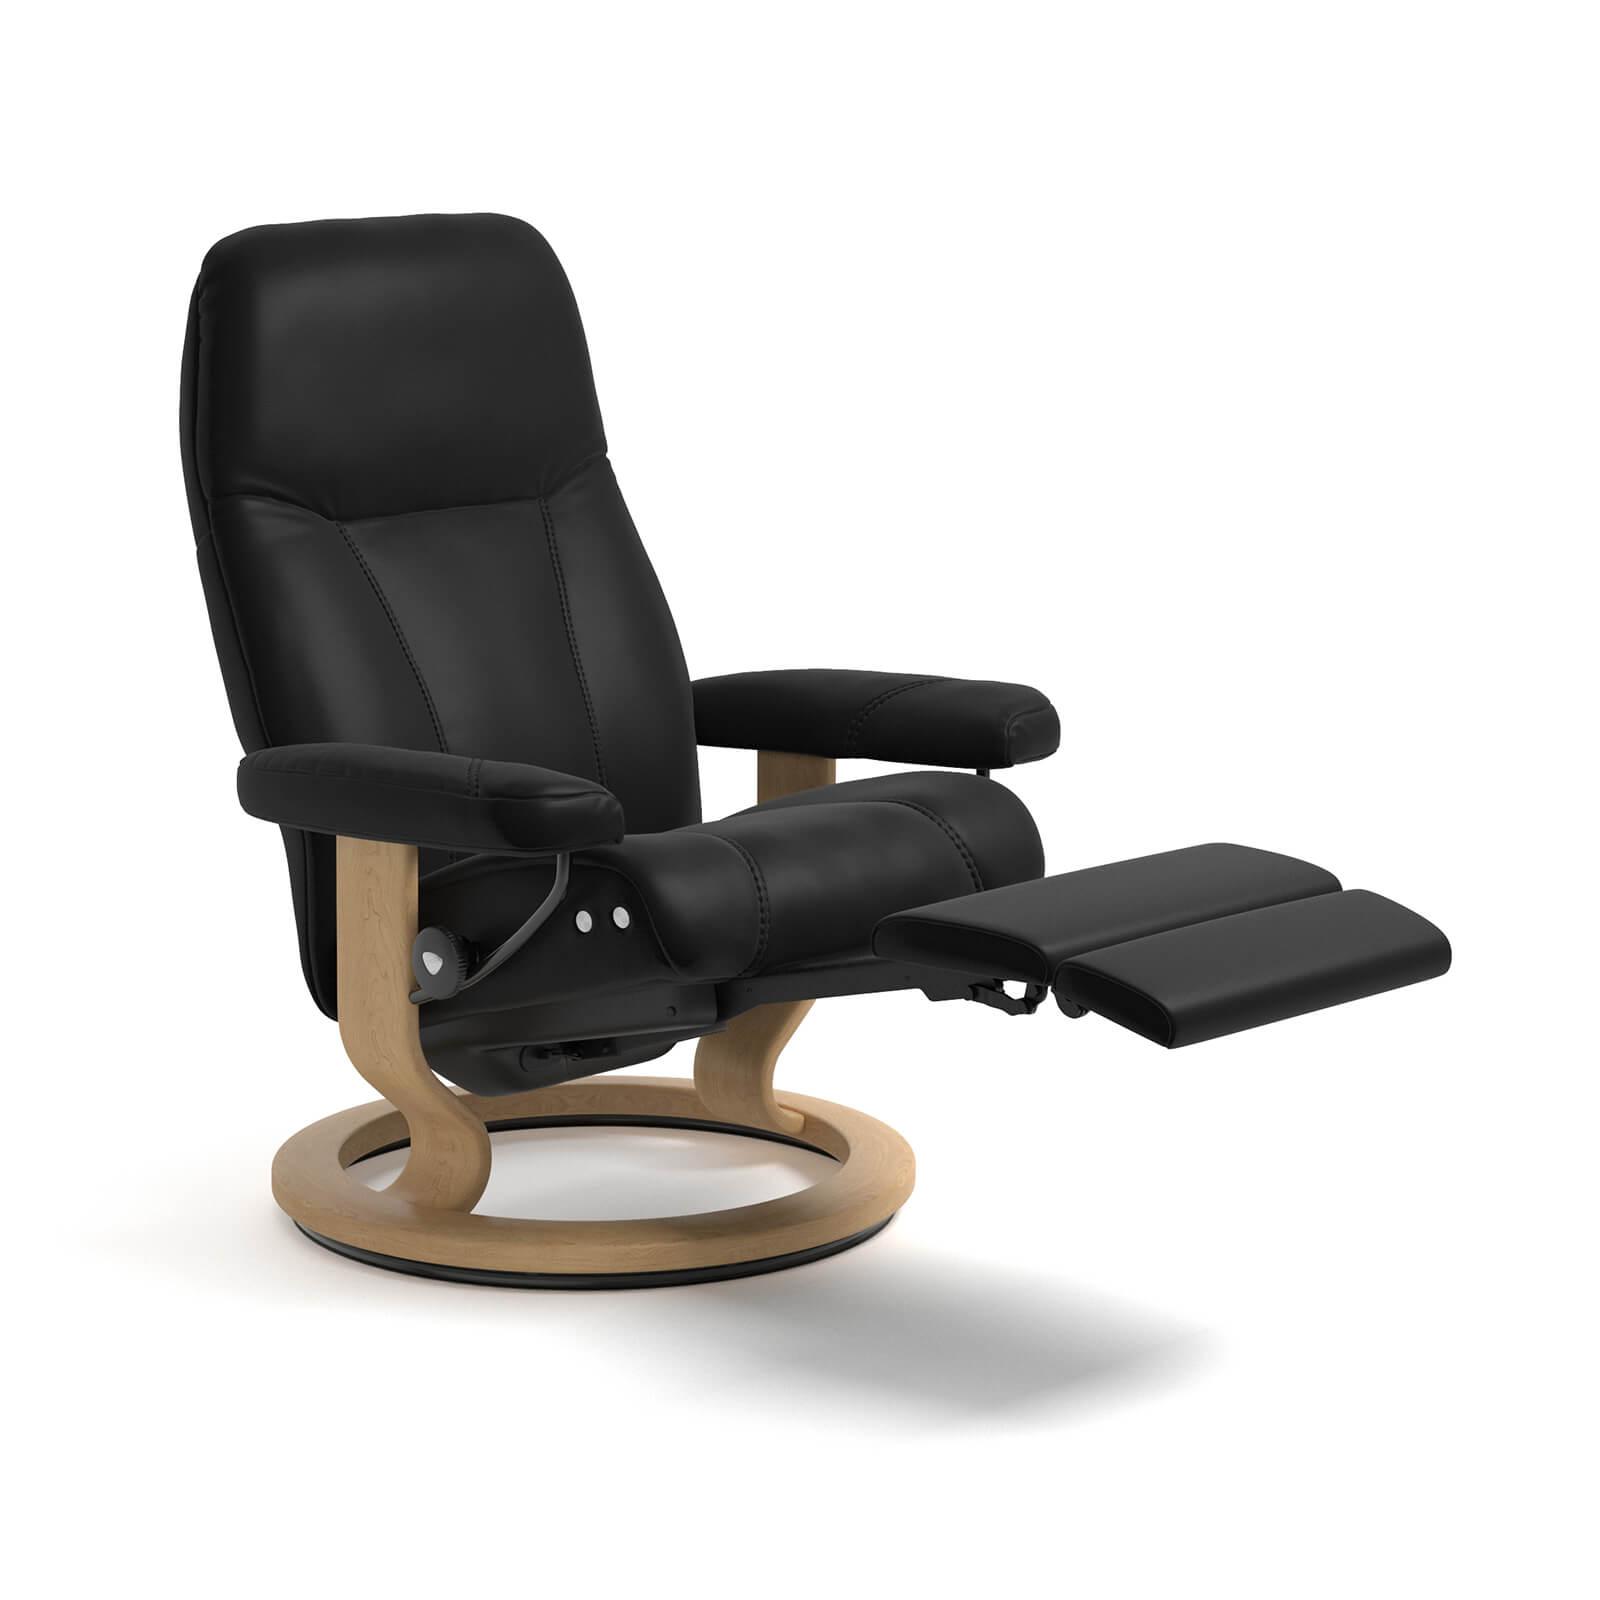 stressless reaxsessel consul legcomfort batick schwarz. Black Bedroom Furniture Sets. Home Design Ideas